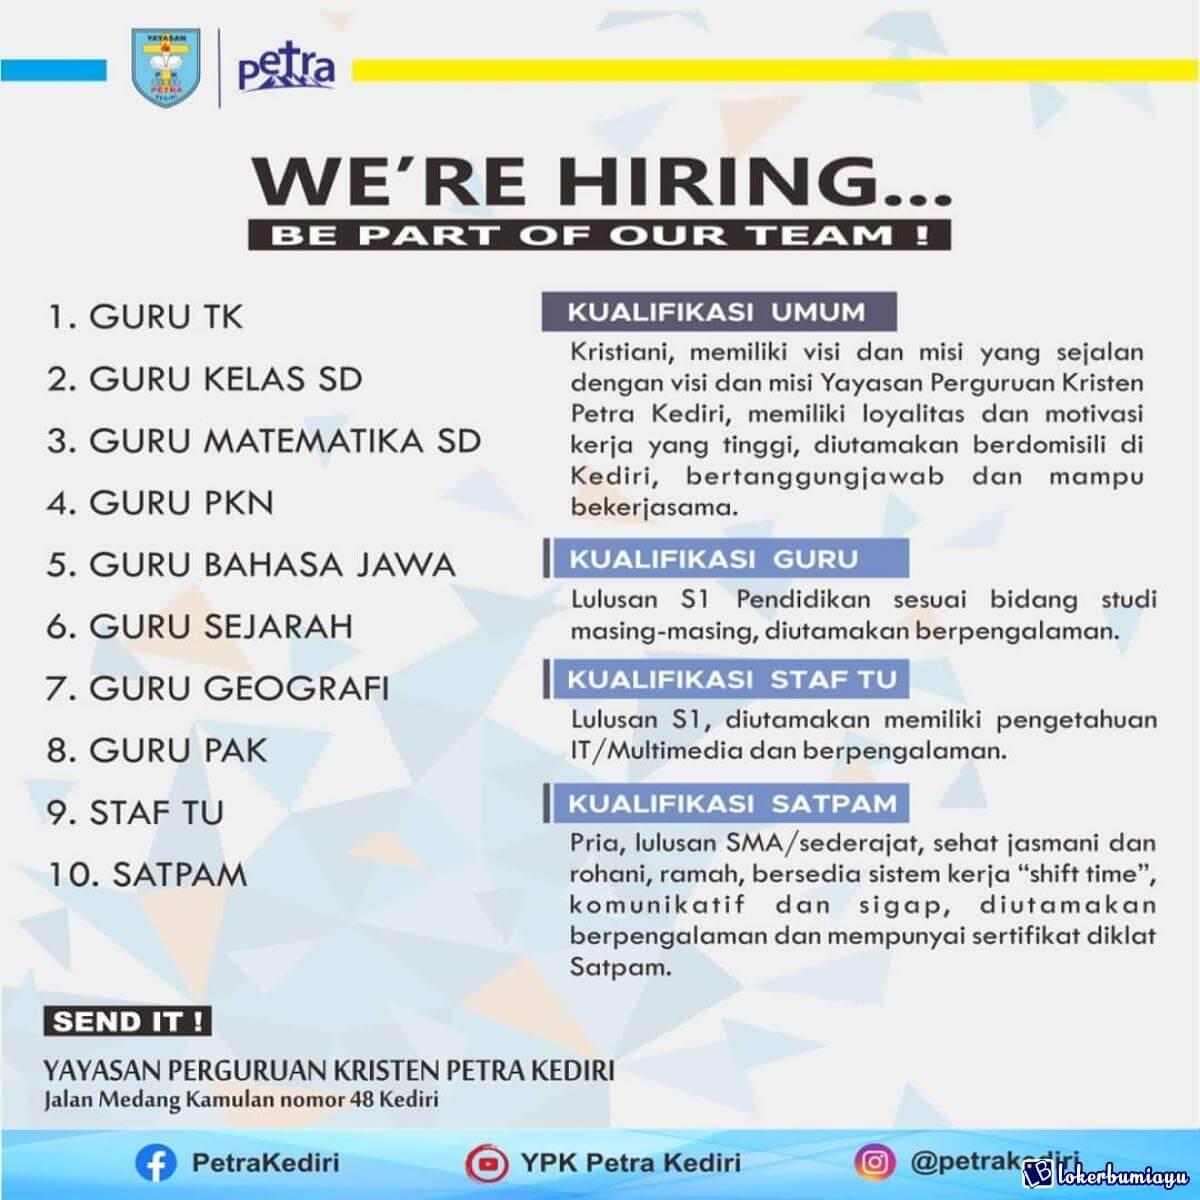 Lowongan Kerja Part Time Untuk Lulusan Sma Di Bandung